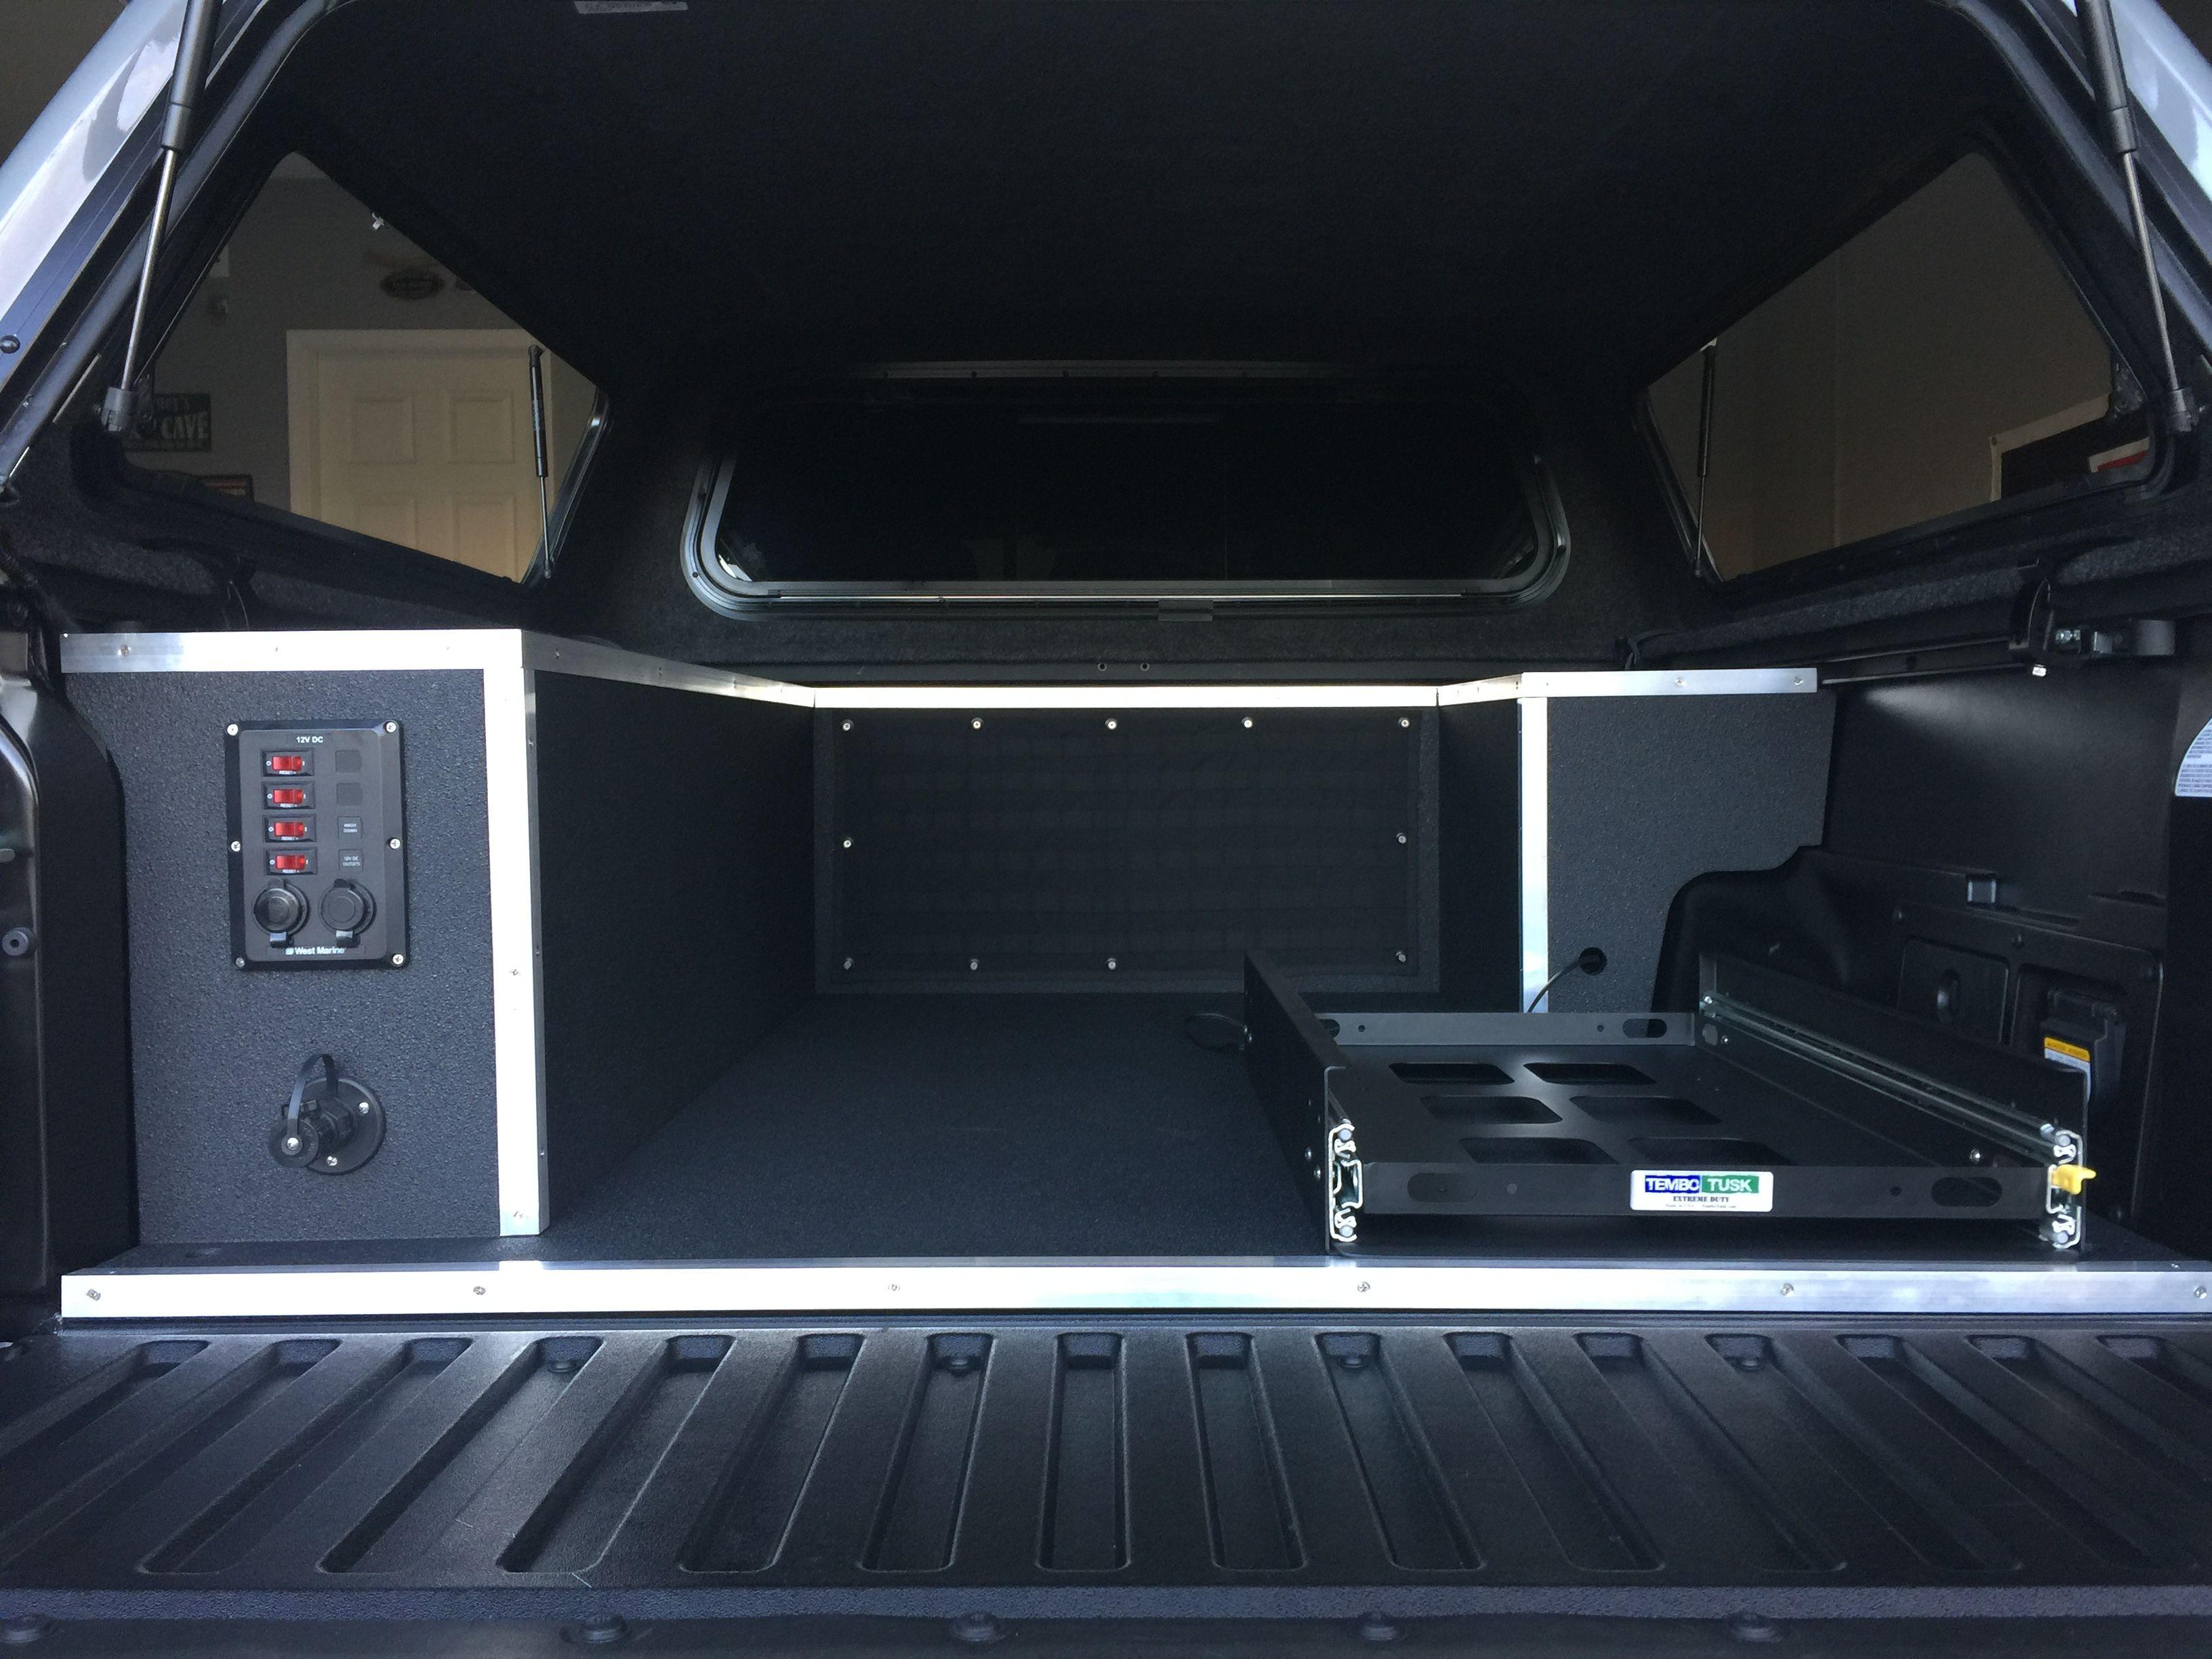 2017 Toyota custom truck bed storage Cargo